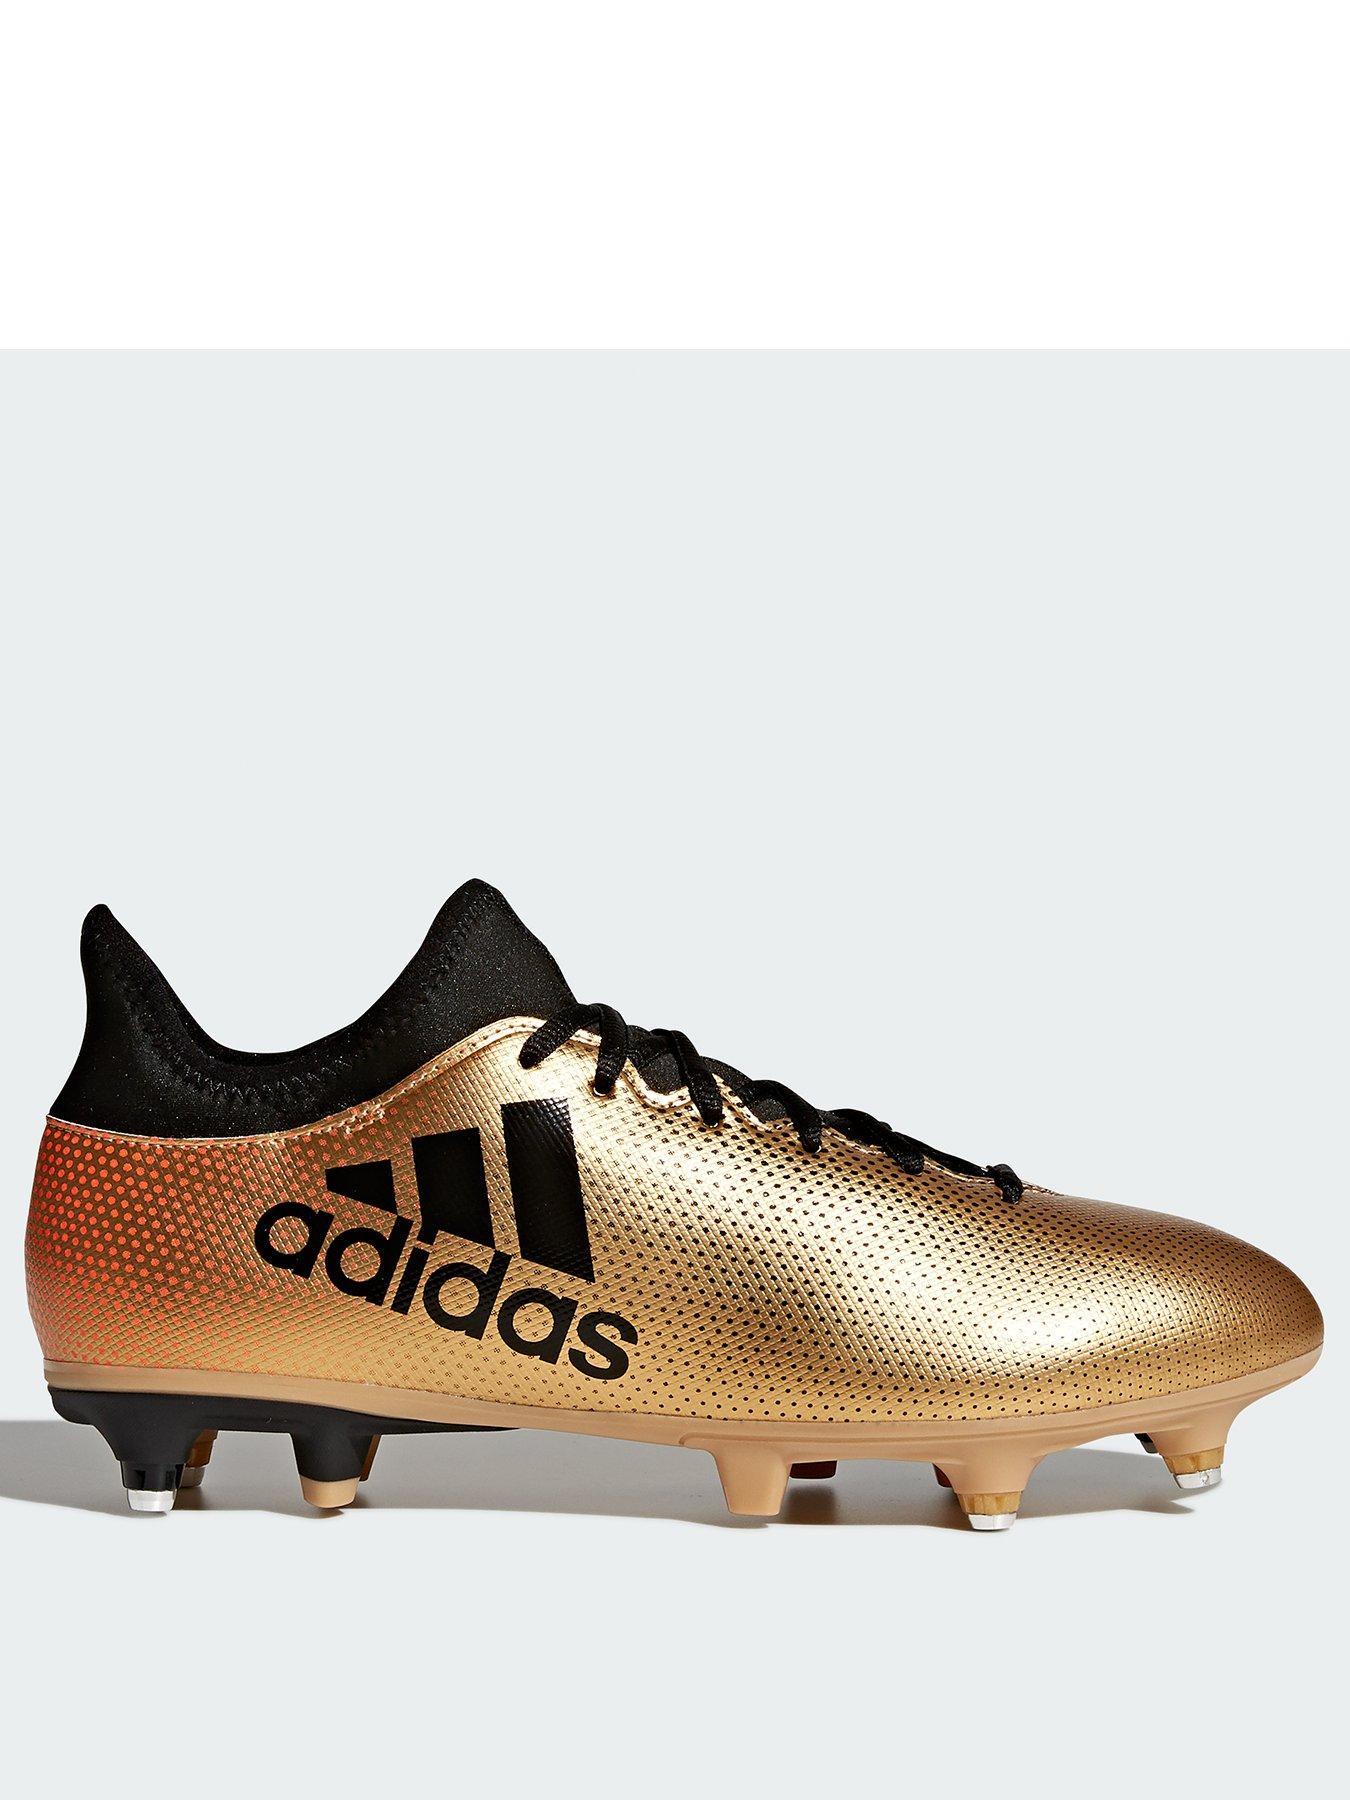 adidas Adidas Mens X 17.3 Soft Ground Football Boot